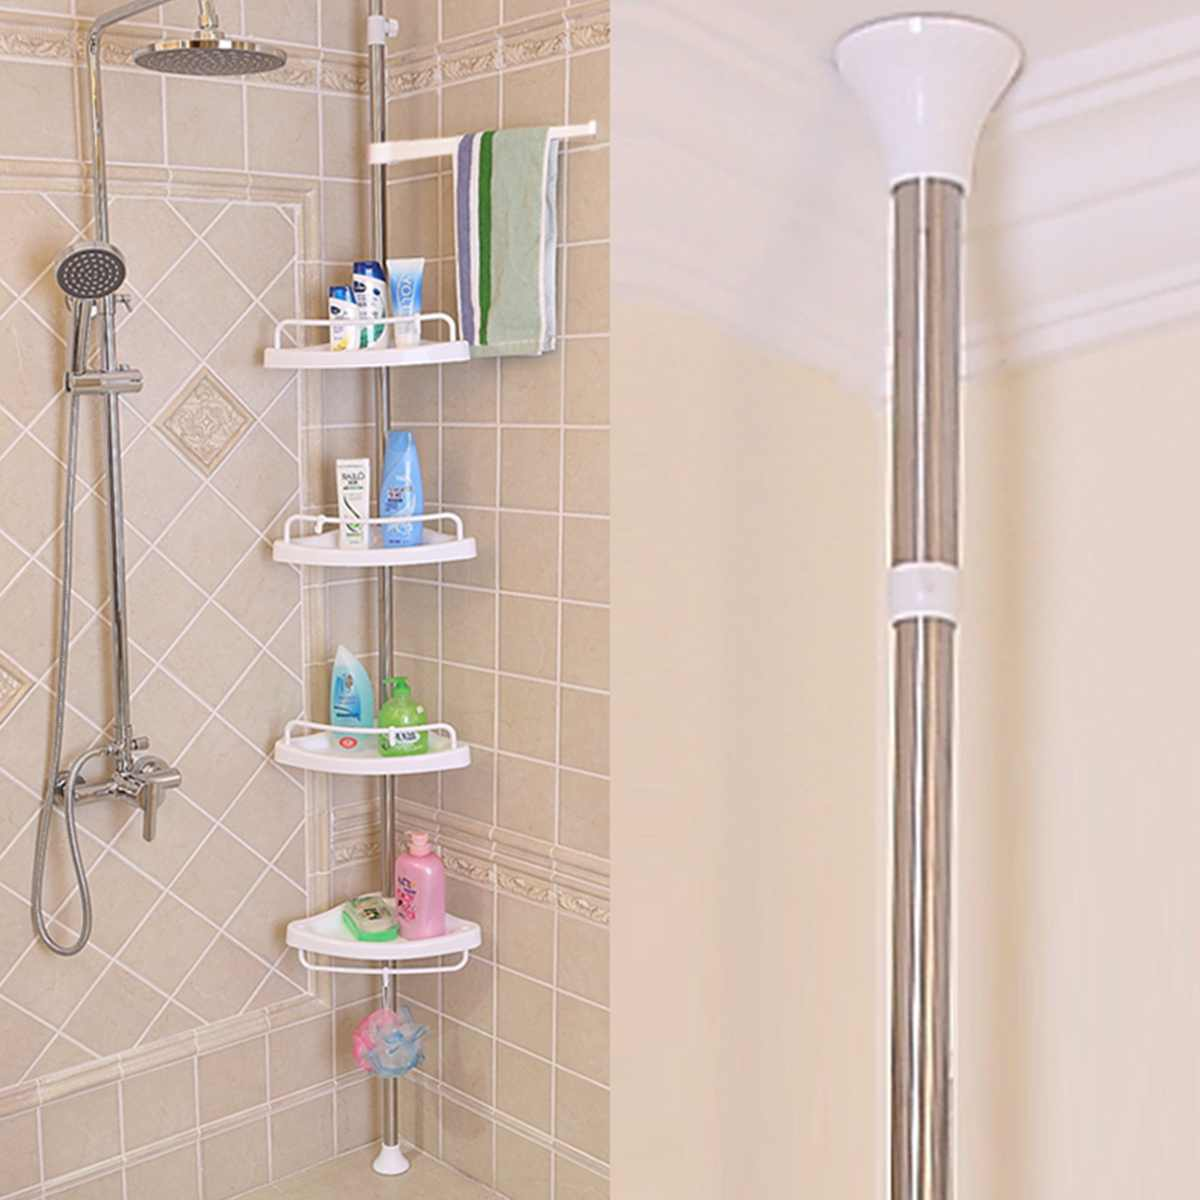 Xueqin 4 Tier Adjustable Telescopic Bathroom Corner Shower Shelf Rack Caddy Organiser 192-310cm Rust-free Pole Self-draining